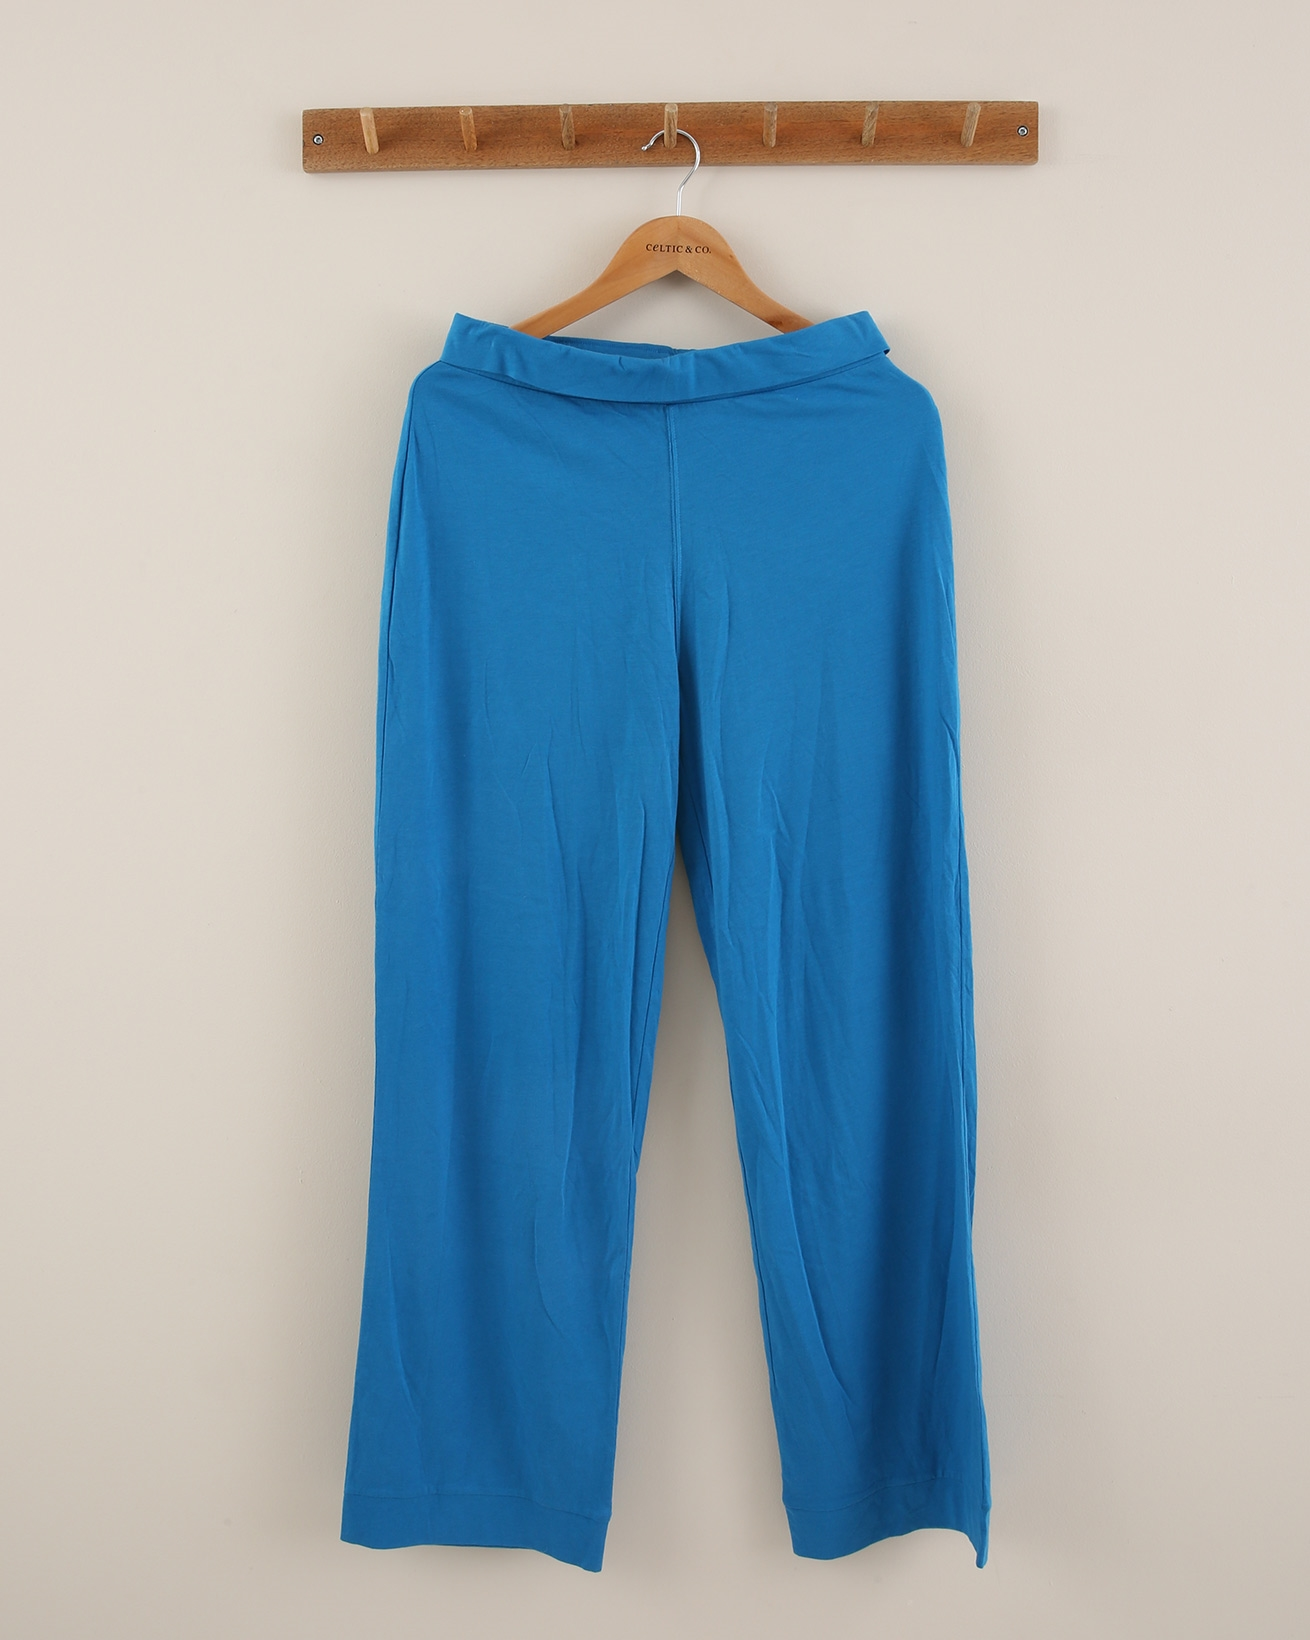 Wide leg cotton lounge pants - Size Small - Azure - 1851